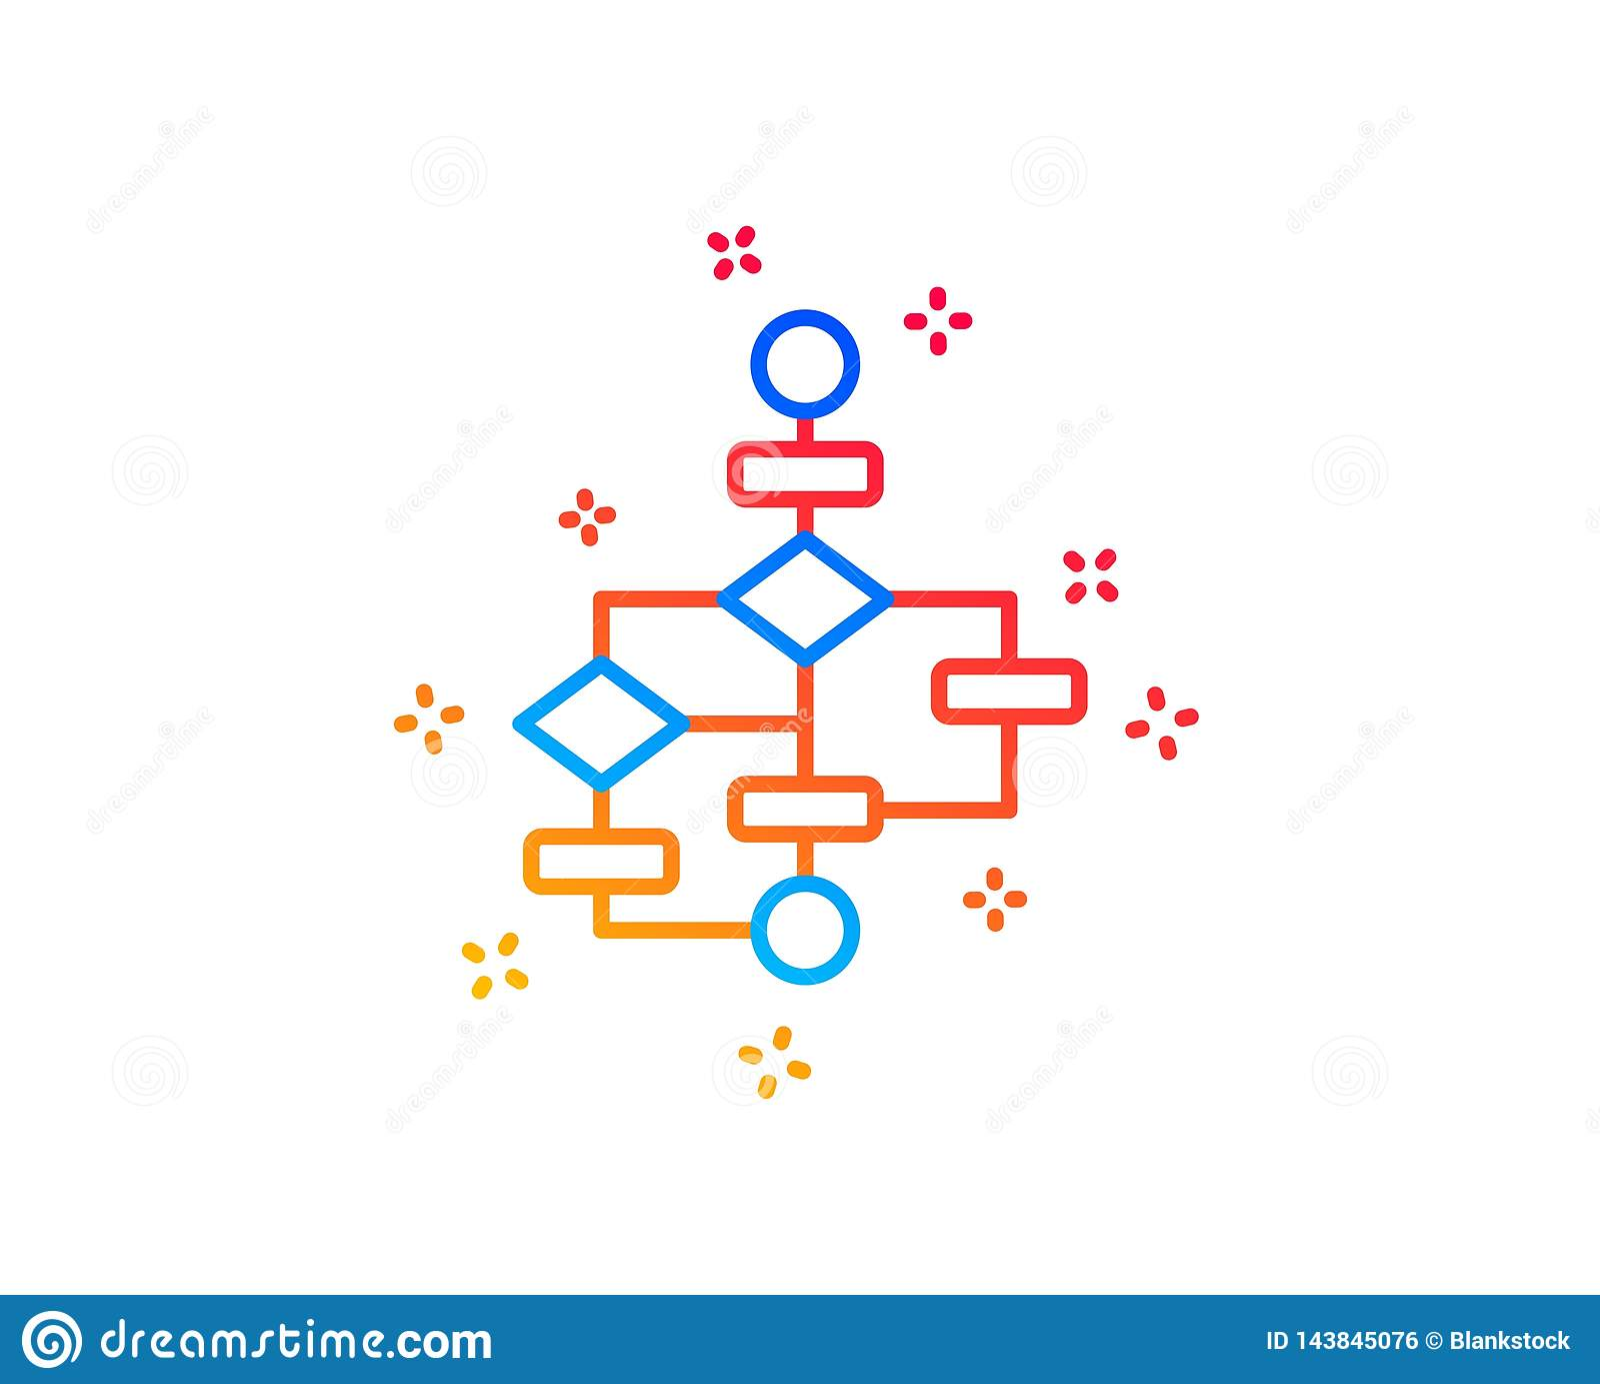 block diagram line icon  path scheme sign  algorithm symbol  gradient  design elements  linear block diagram icon  random shapes  vector